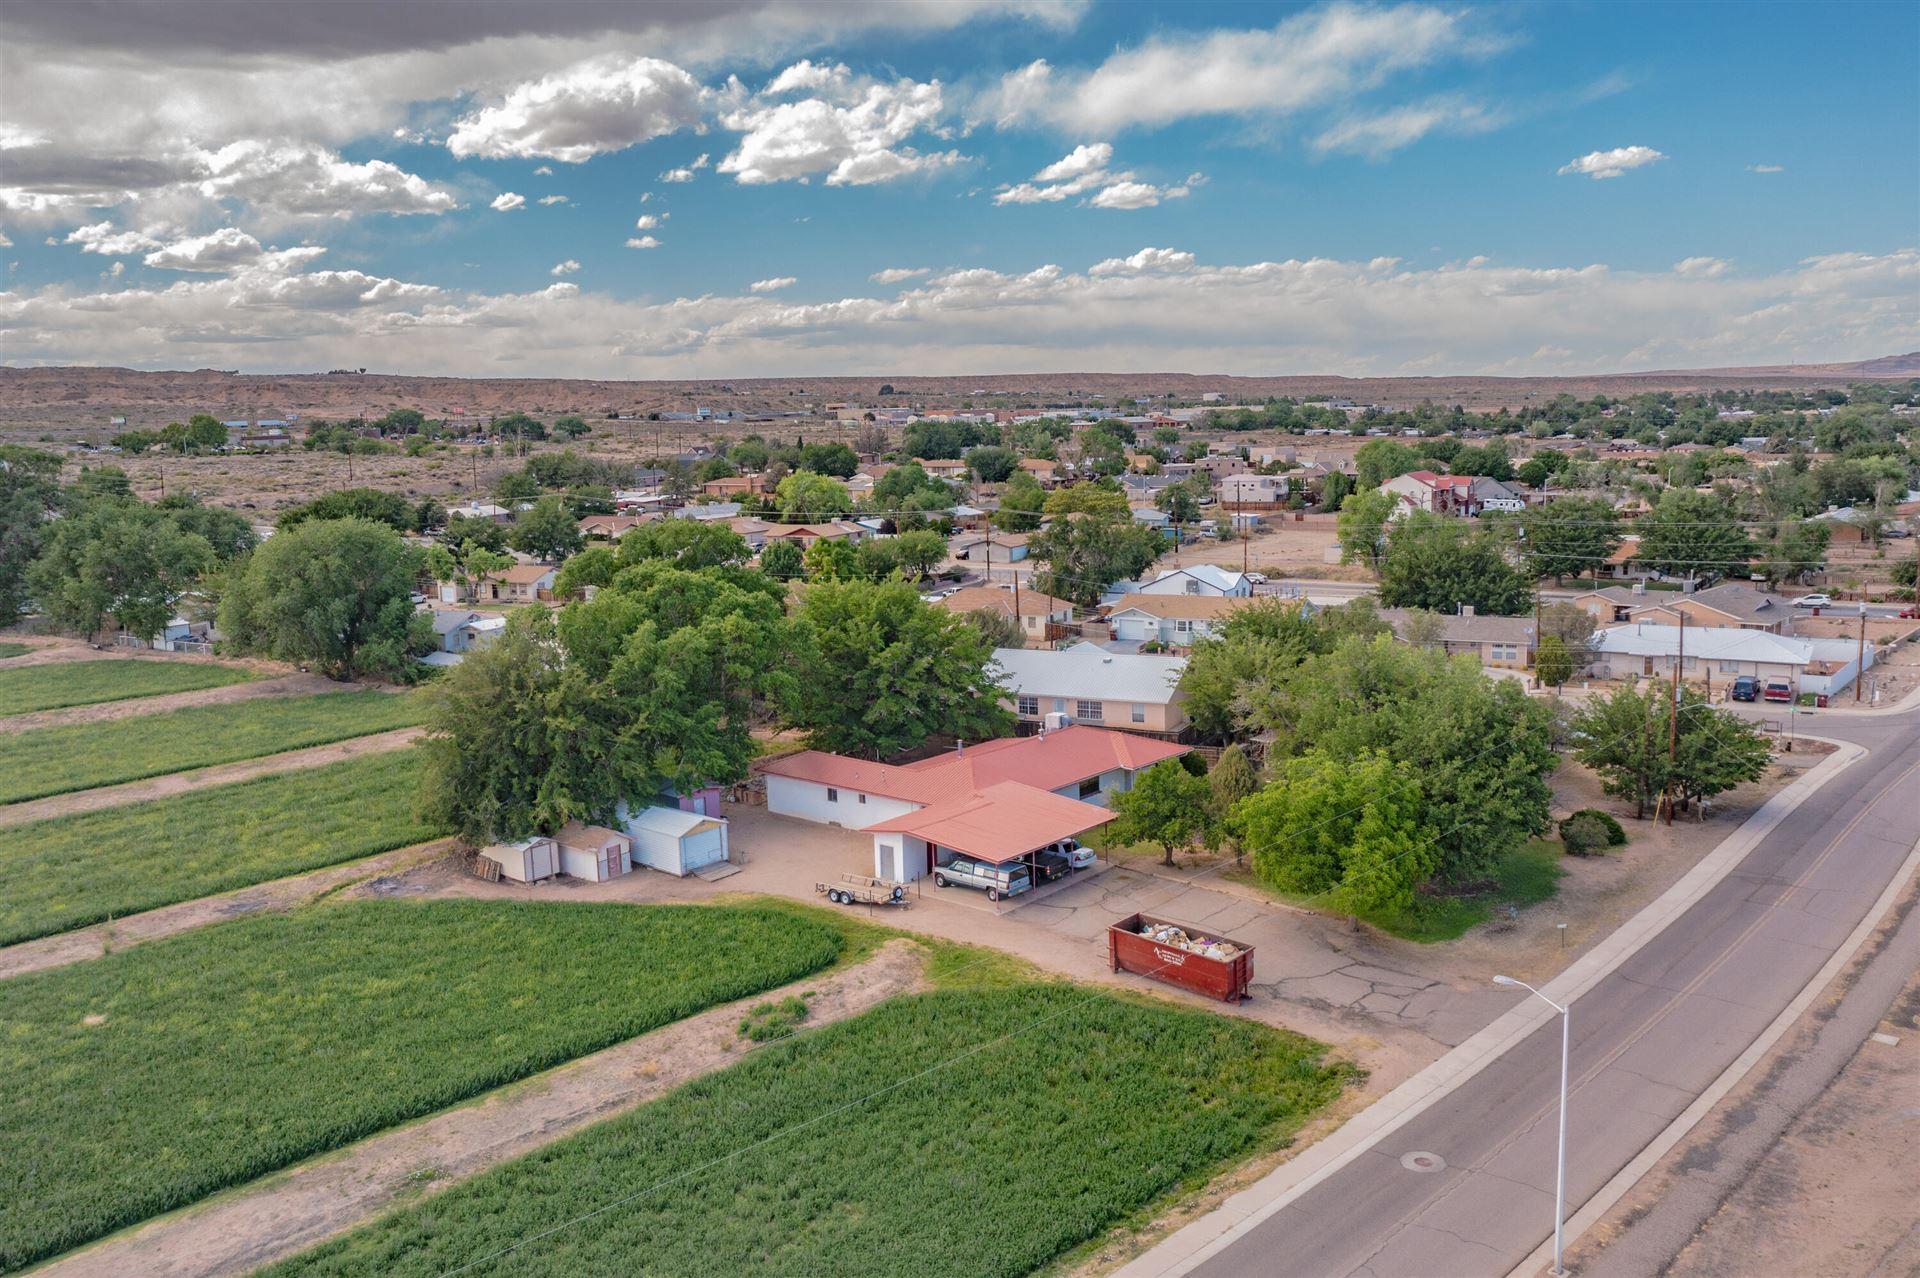 Photo of 803 S MESA Road, Belen, NM 87002 (MLS # 994771)